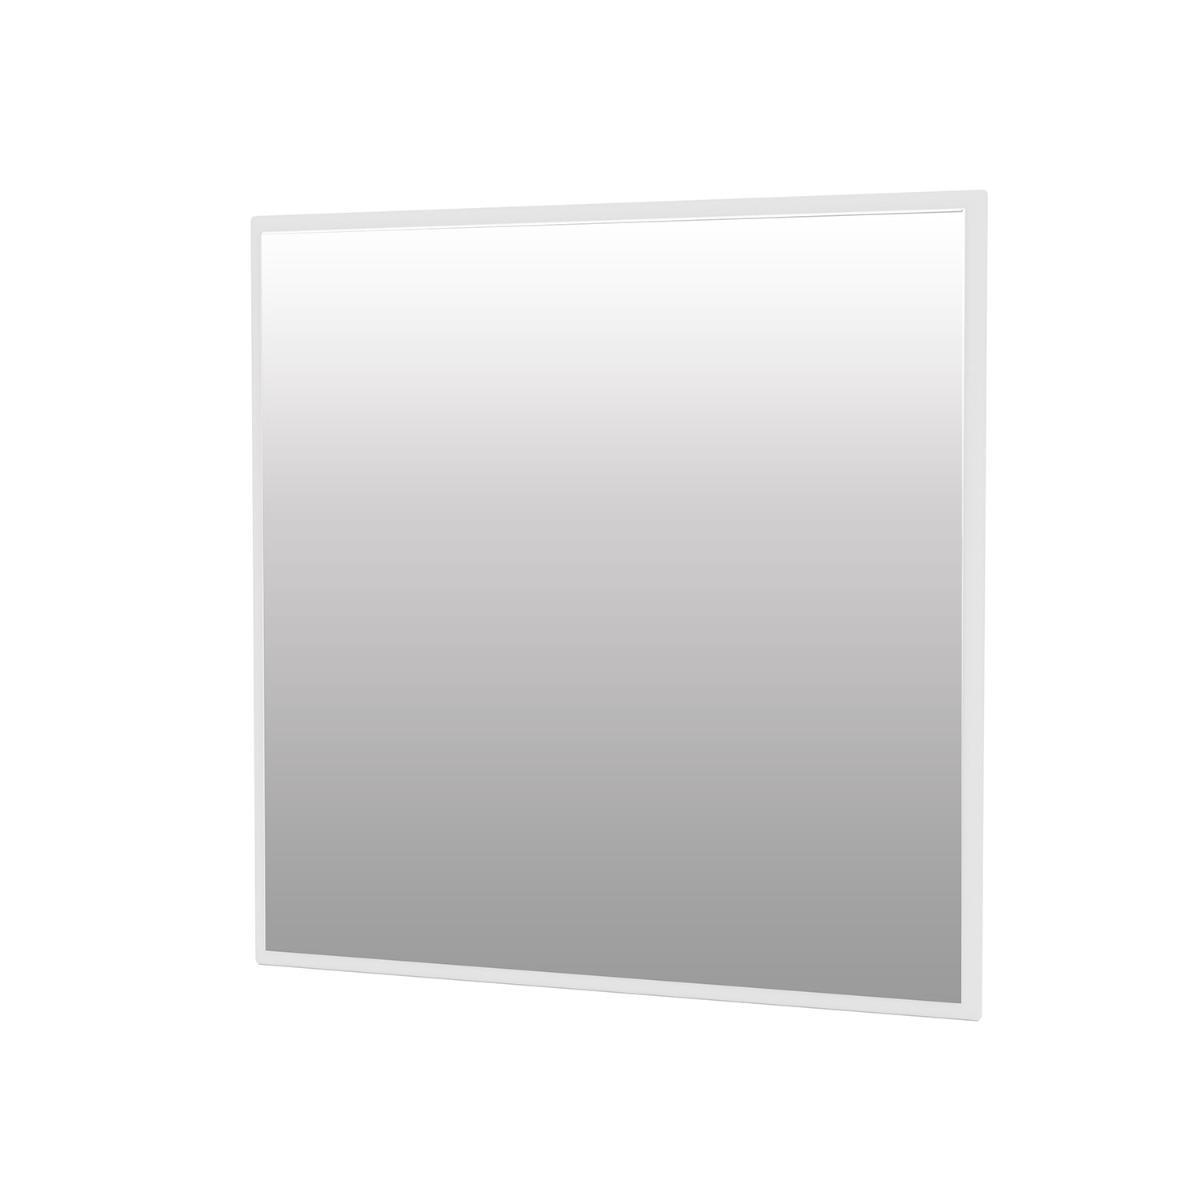 Montana Mini Spegel Fyrkantig 35x35 cm New White